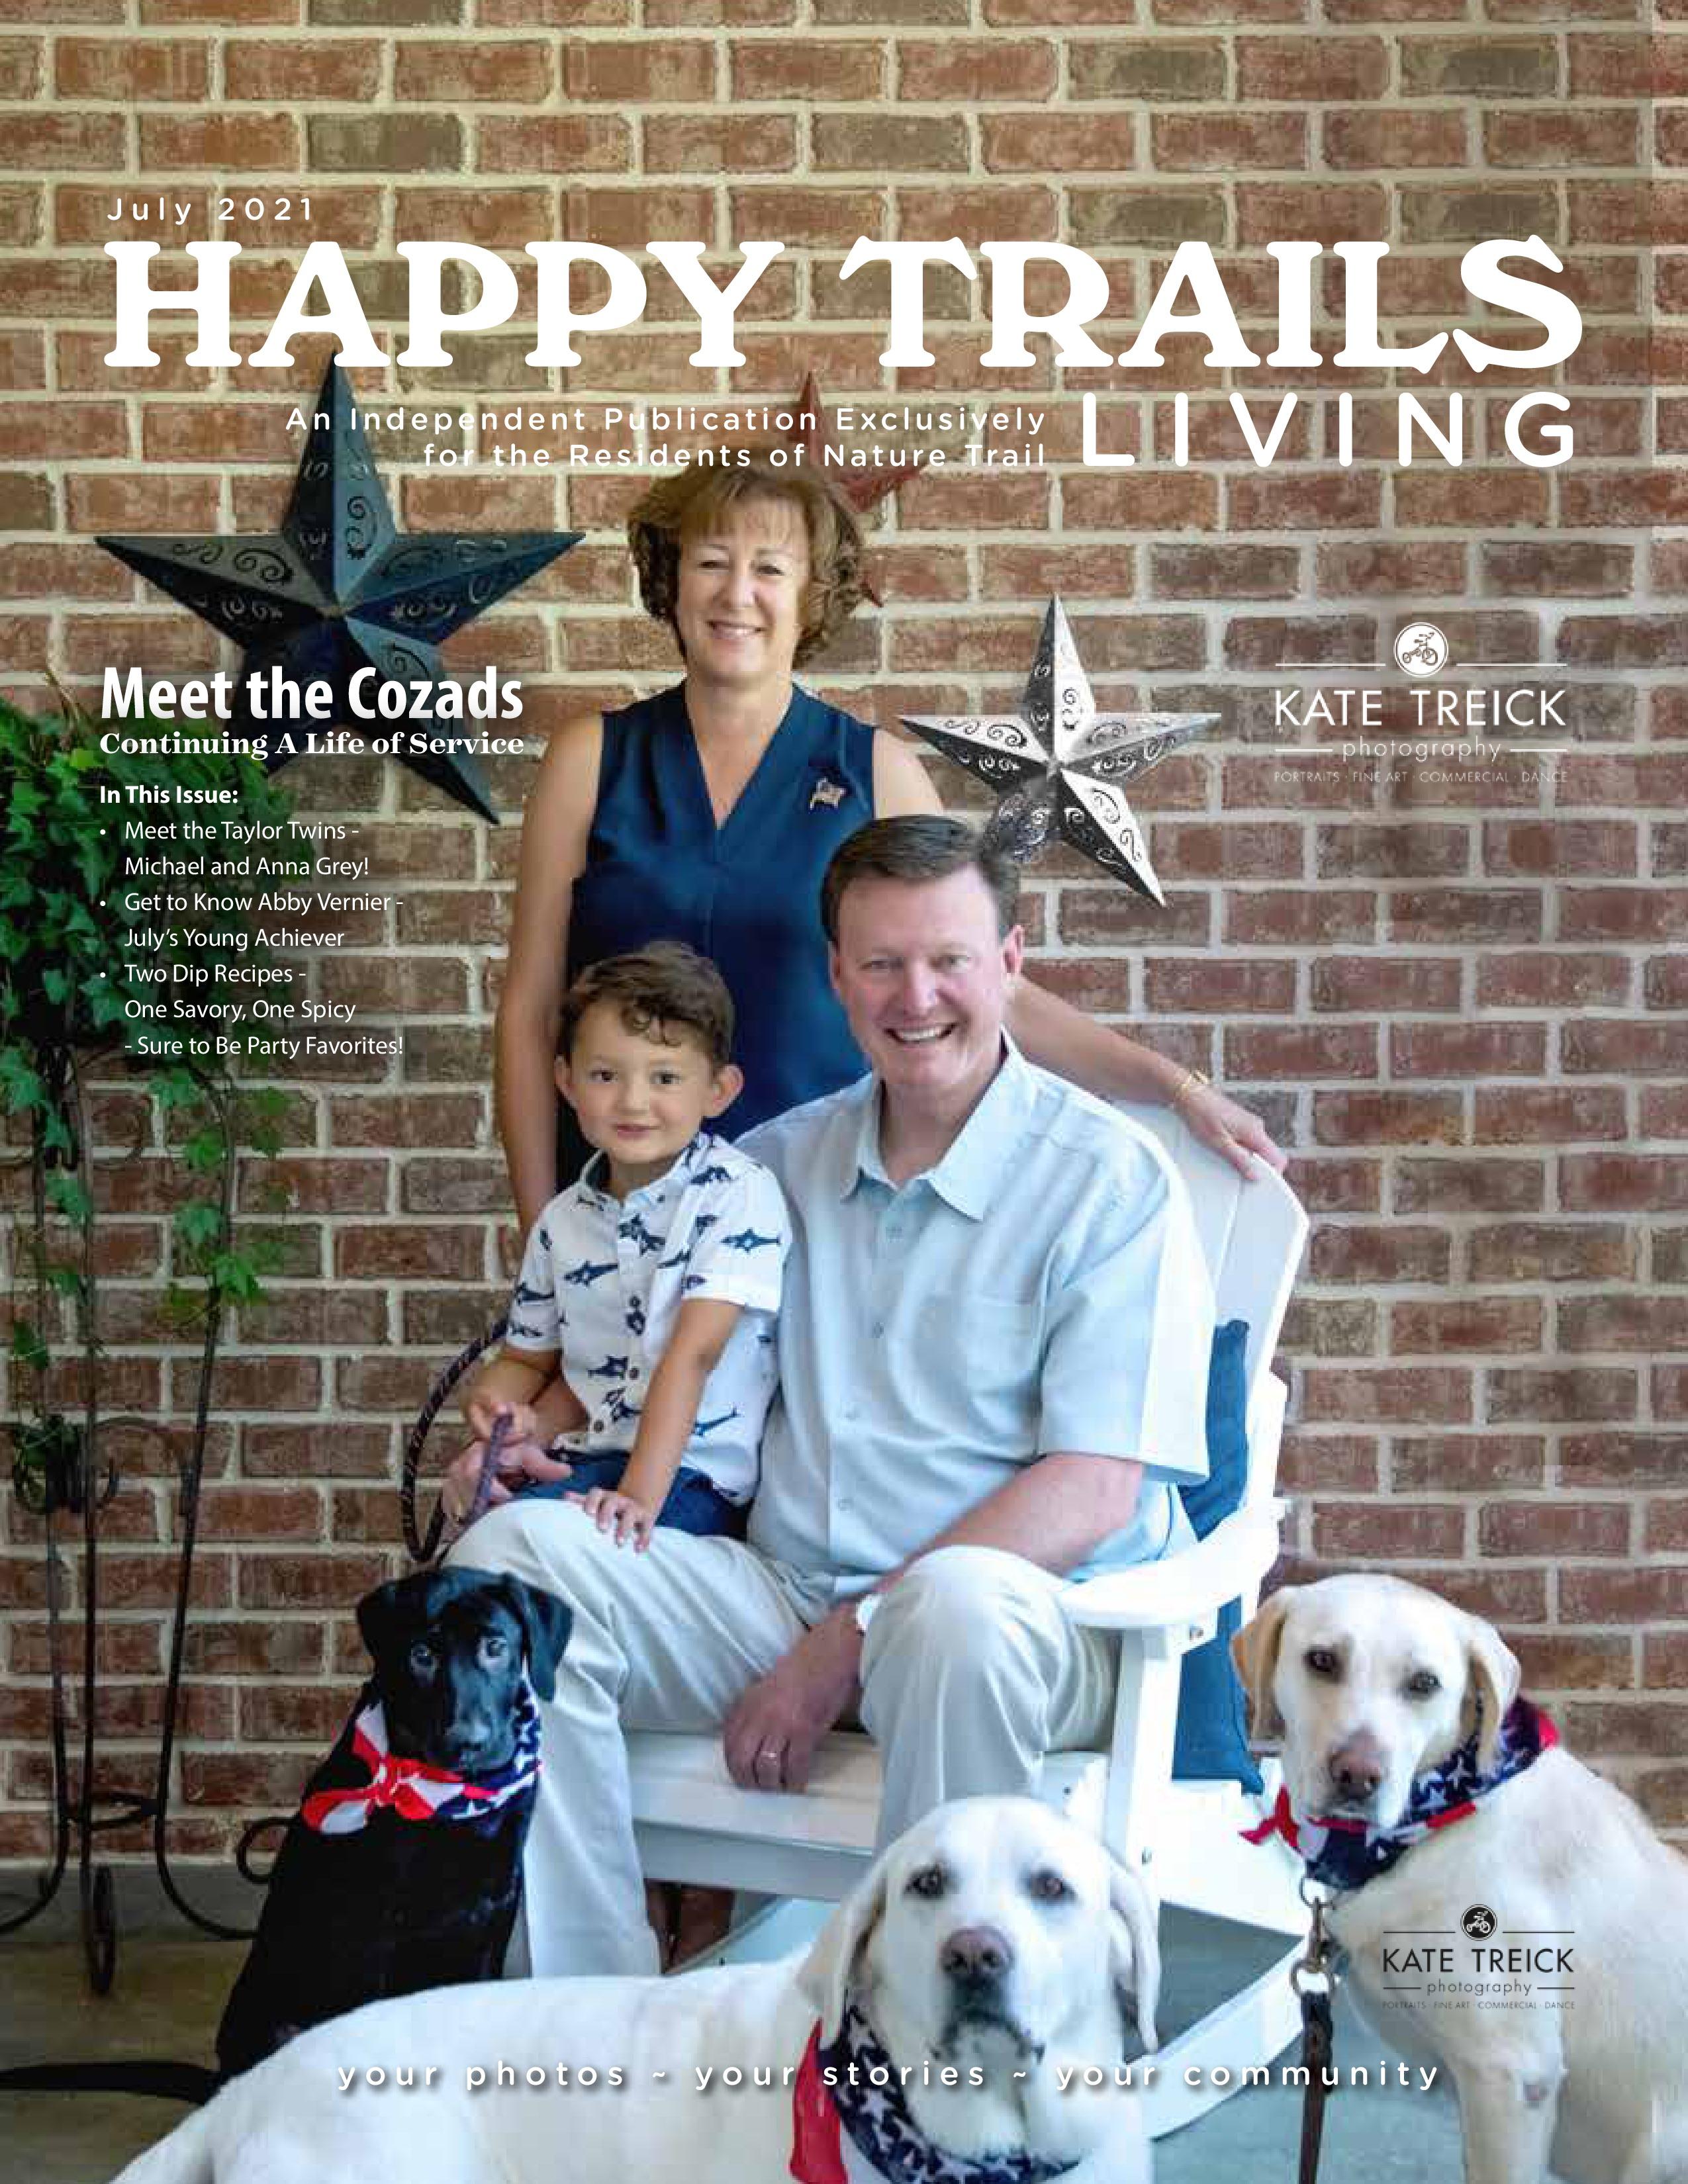 Happy Trails Living 2021-07-01